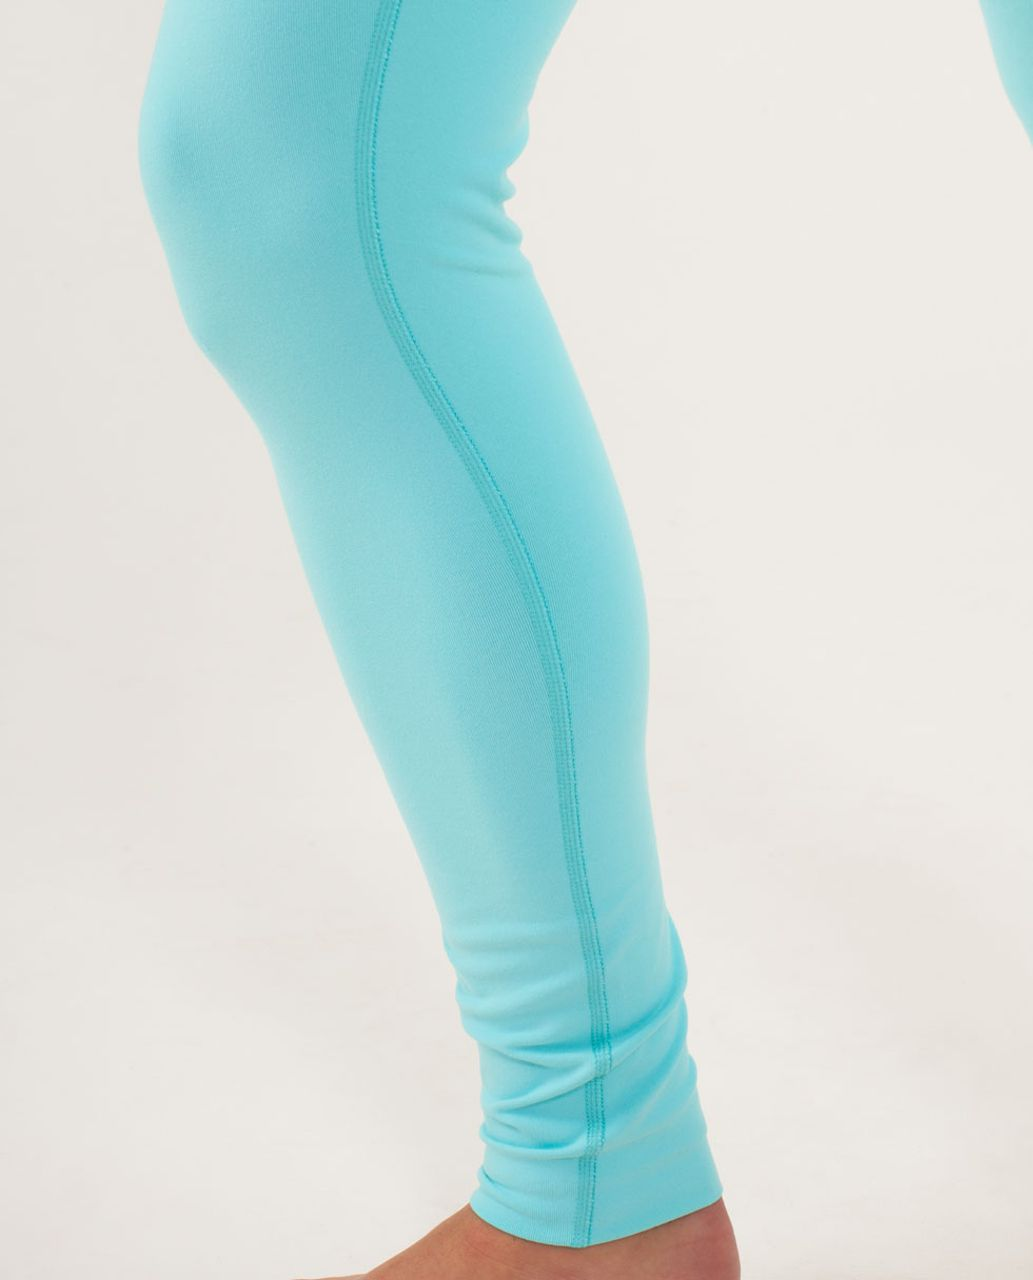 Lululemon Wunder Under Pant - Angel Blue